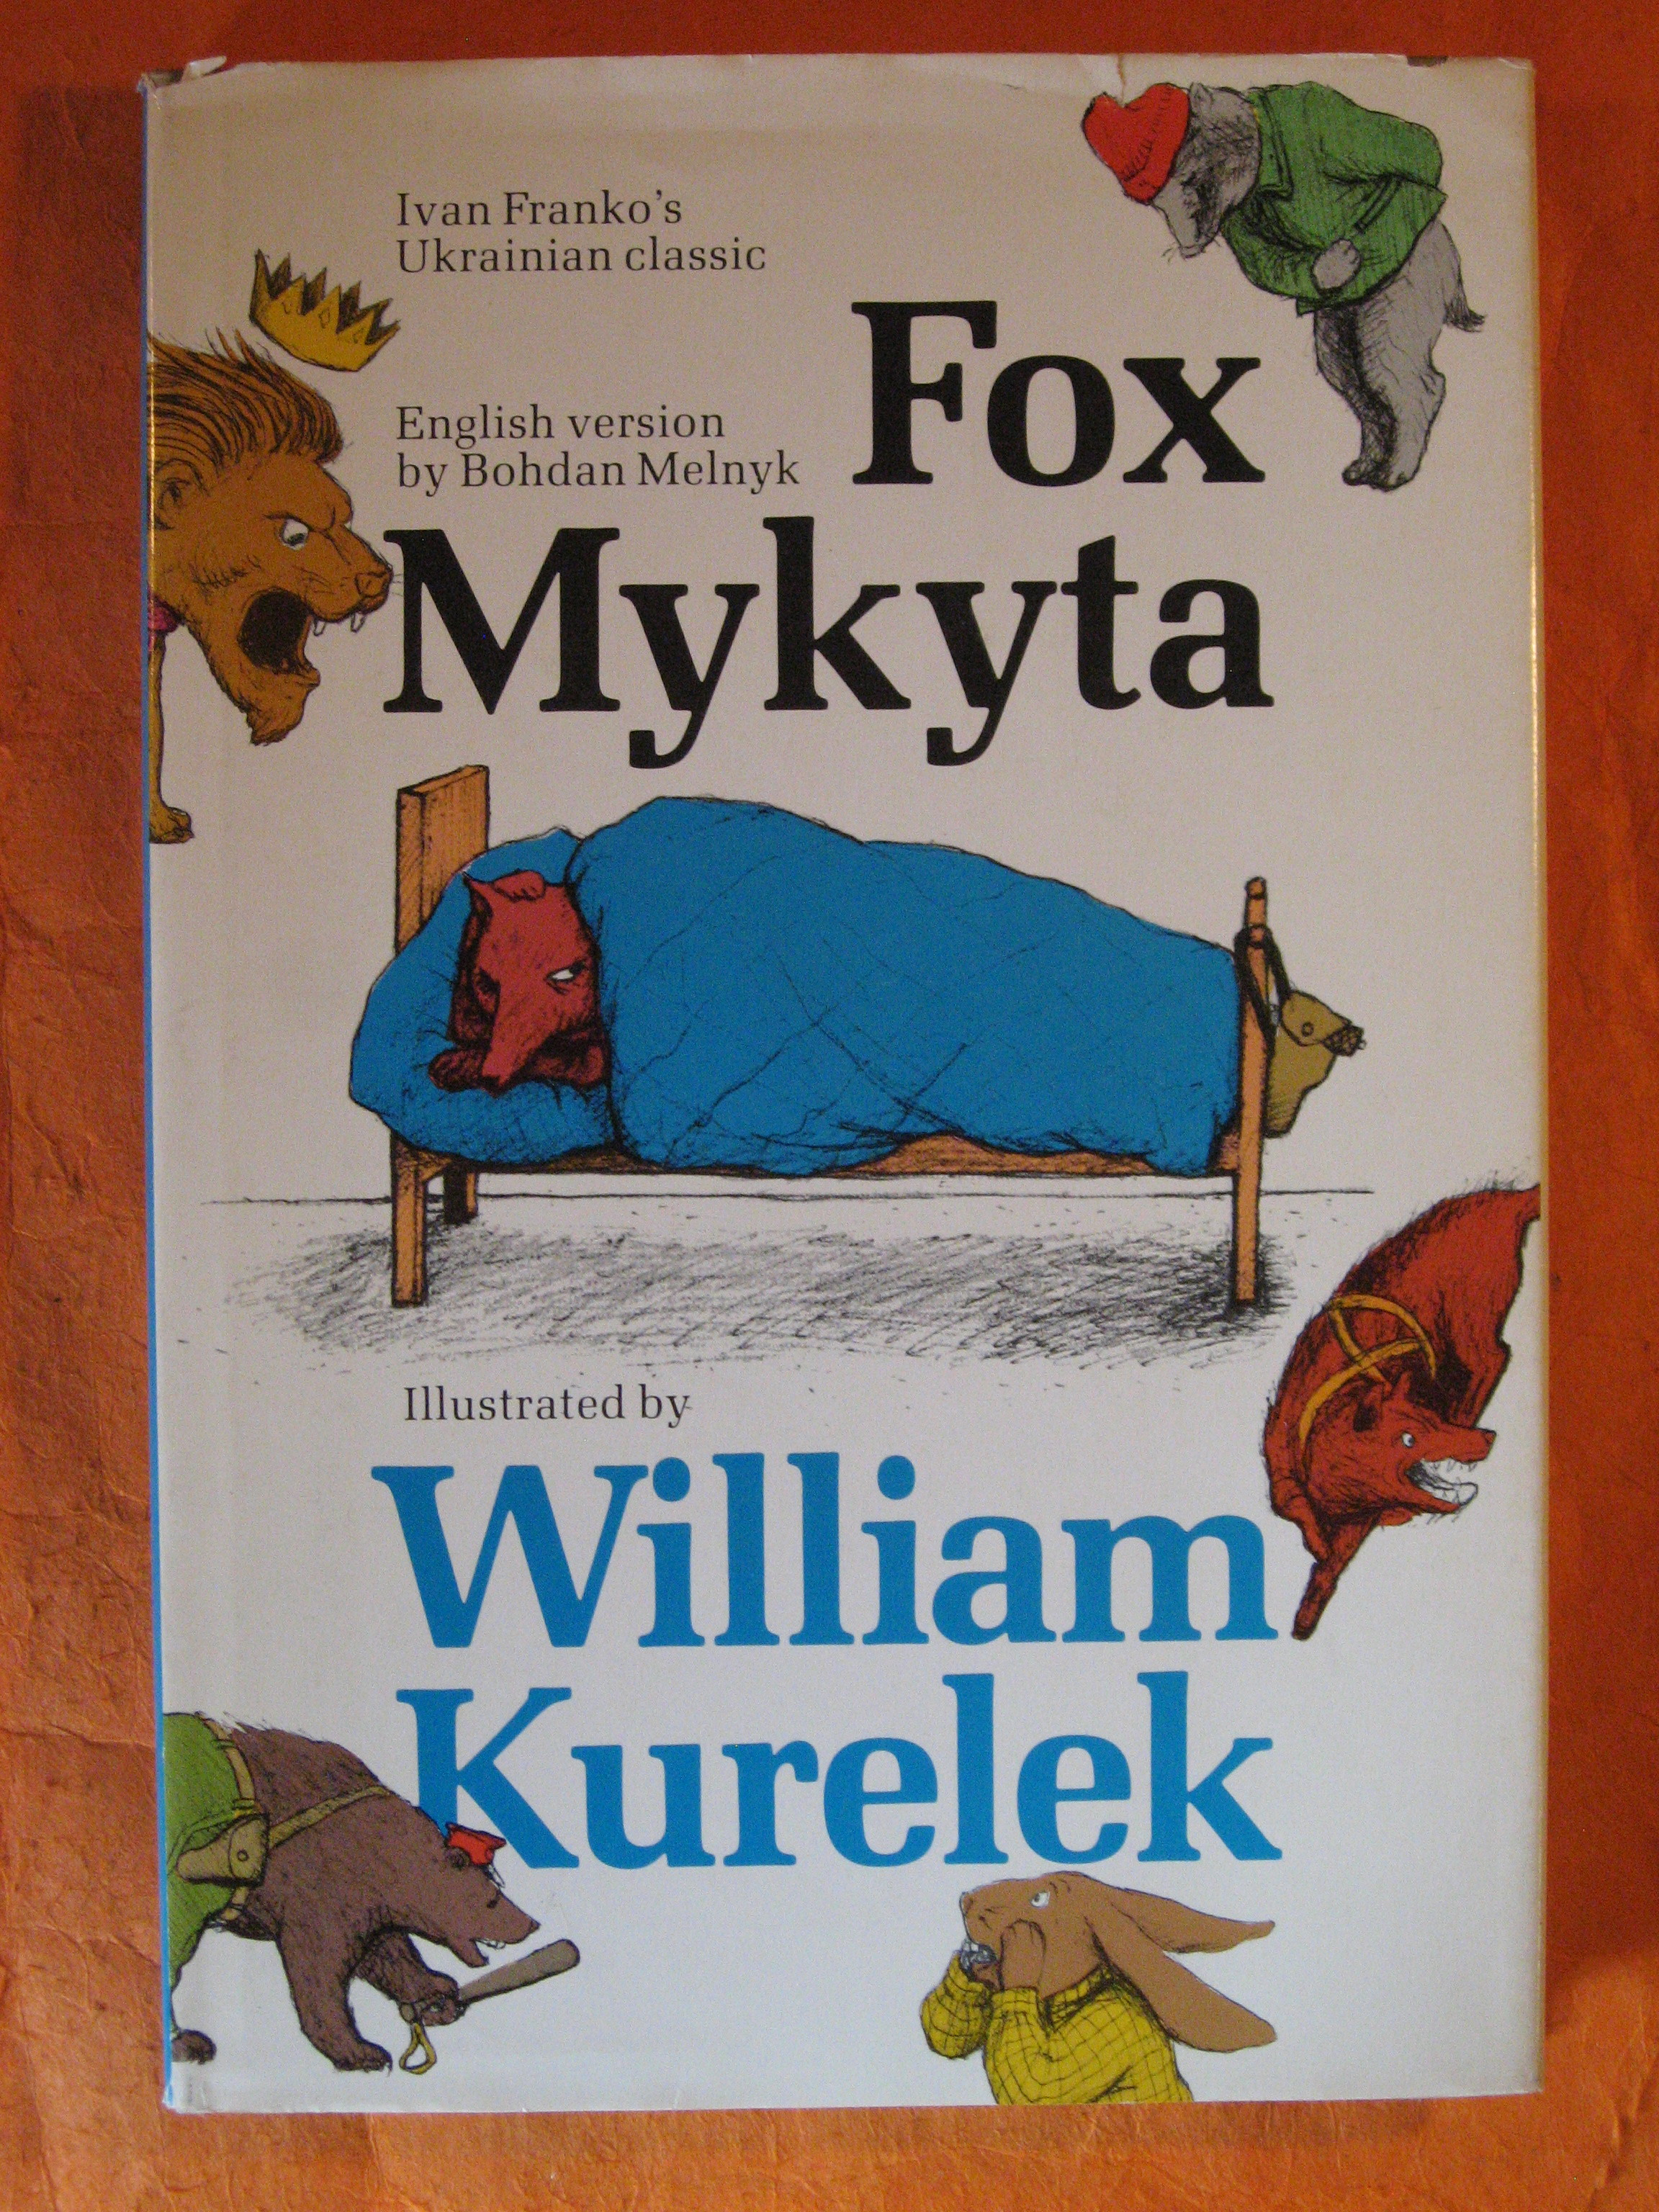 Fox Mykyta / Lys Mykyta (Ivan Franko's Ukrainian Classic)